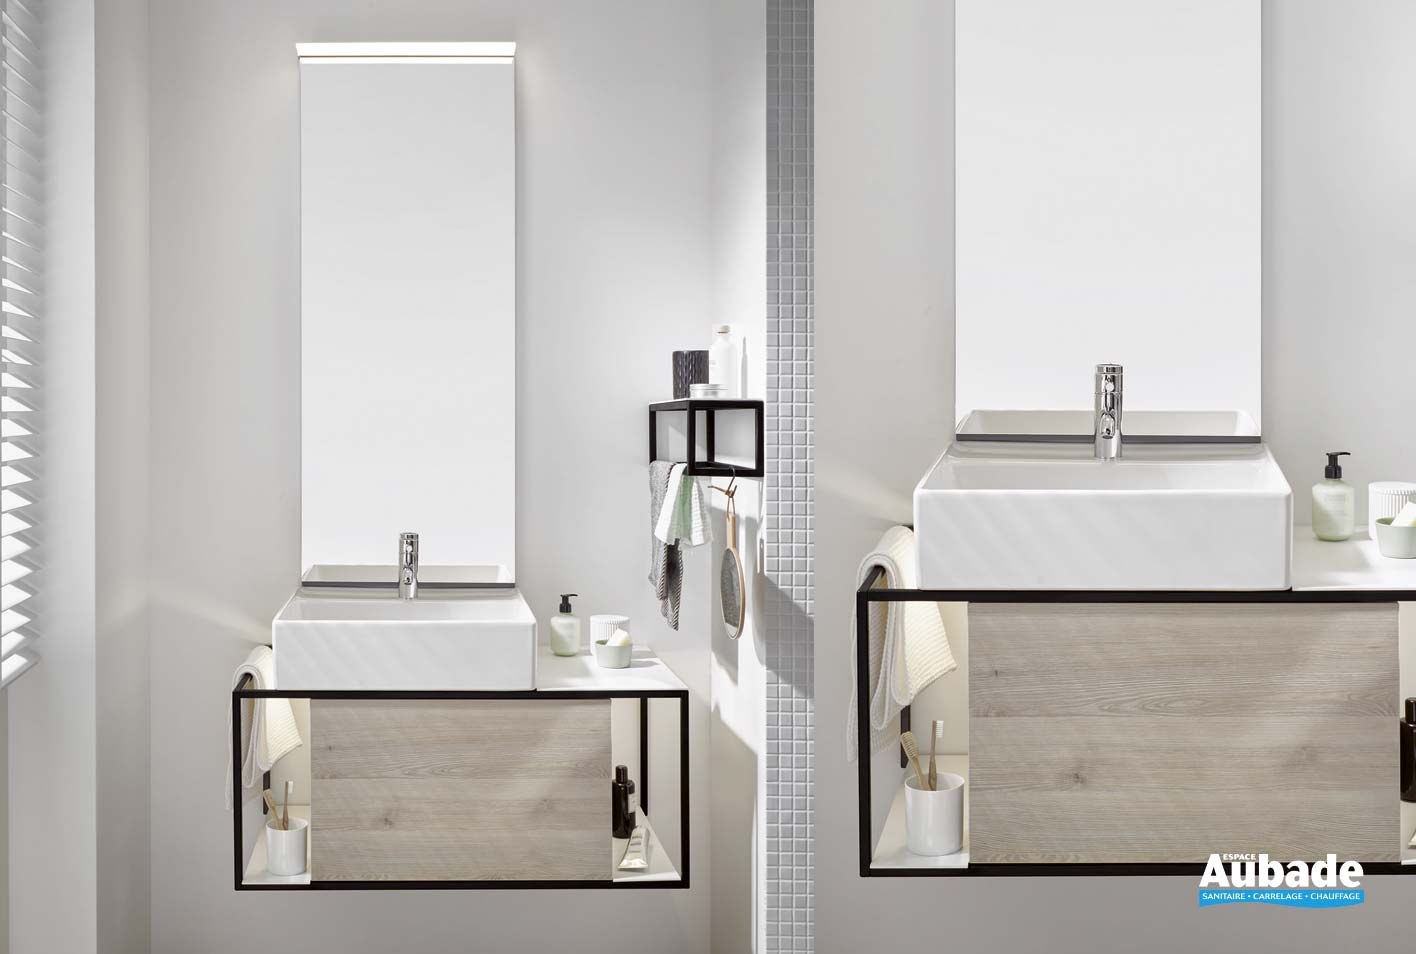 meuble salle de bain junit de burgbad espace aubade